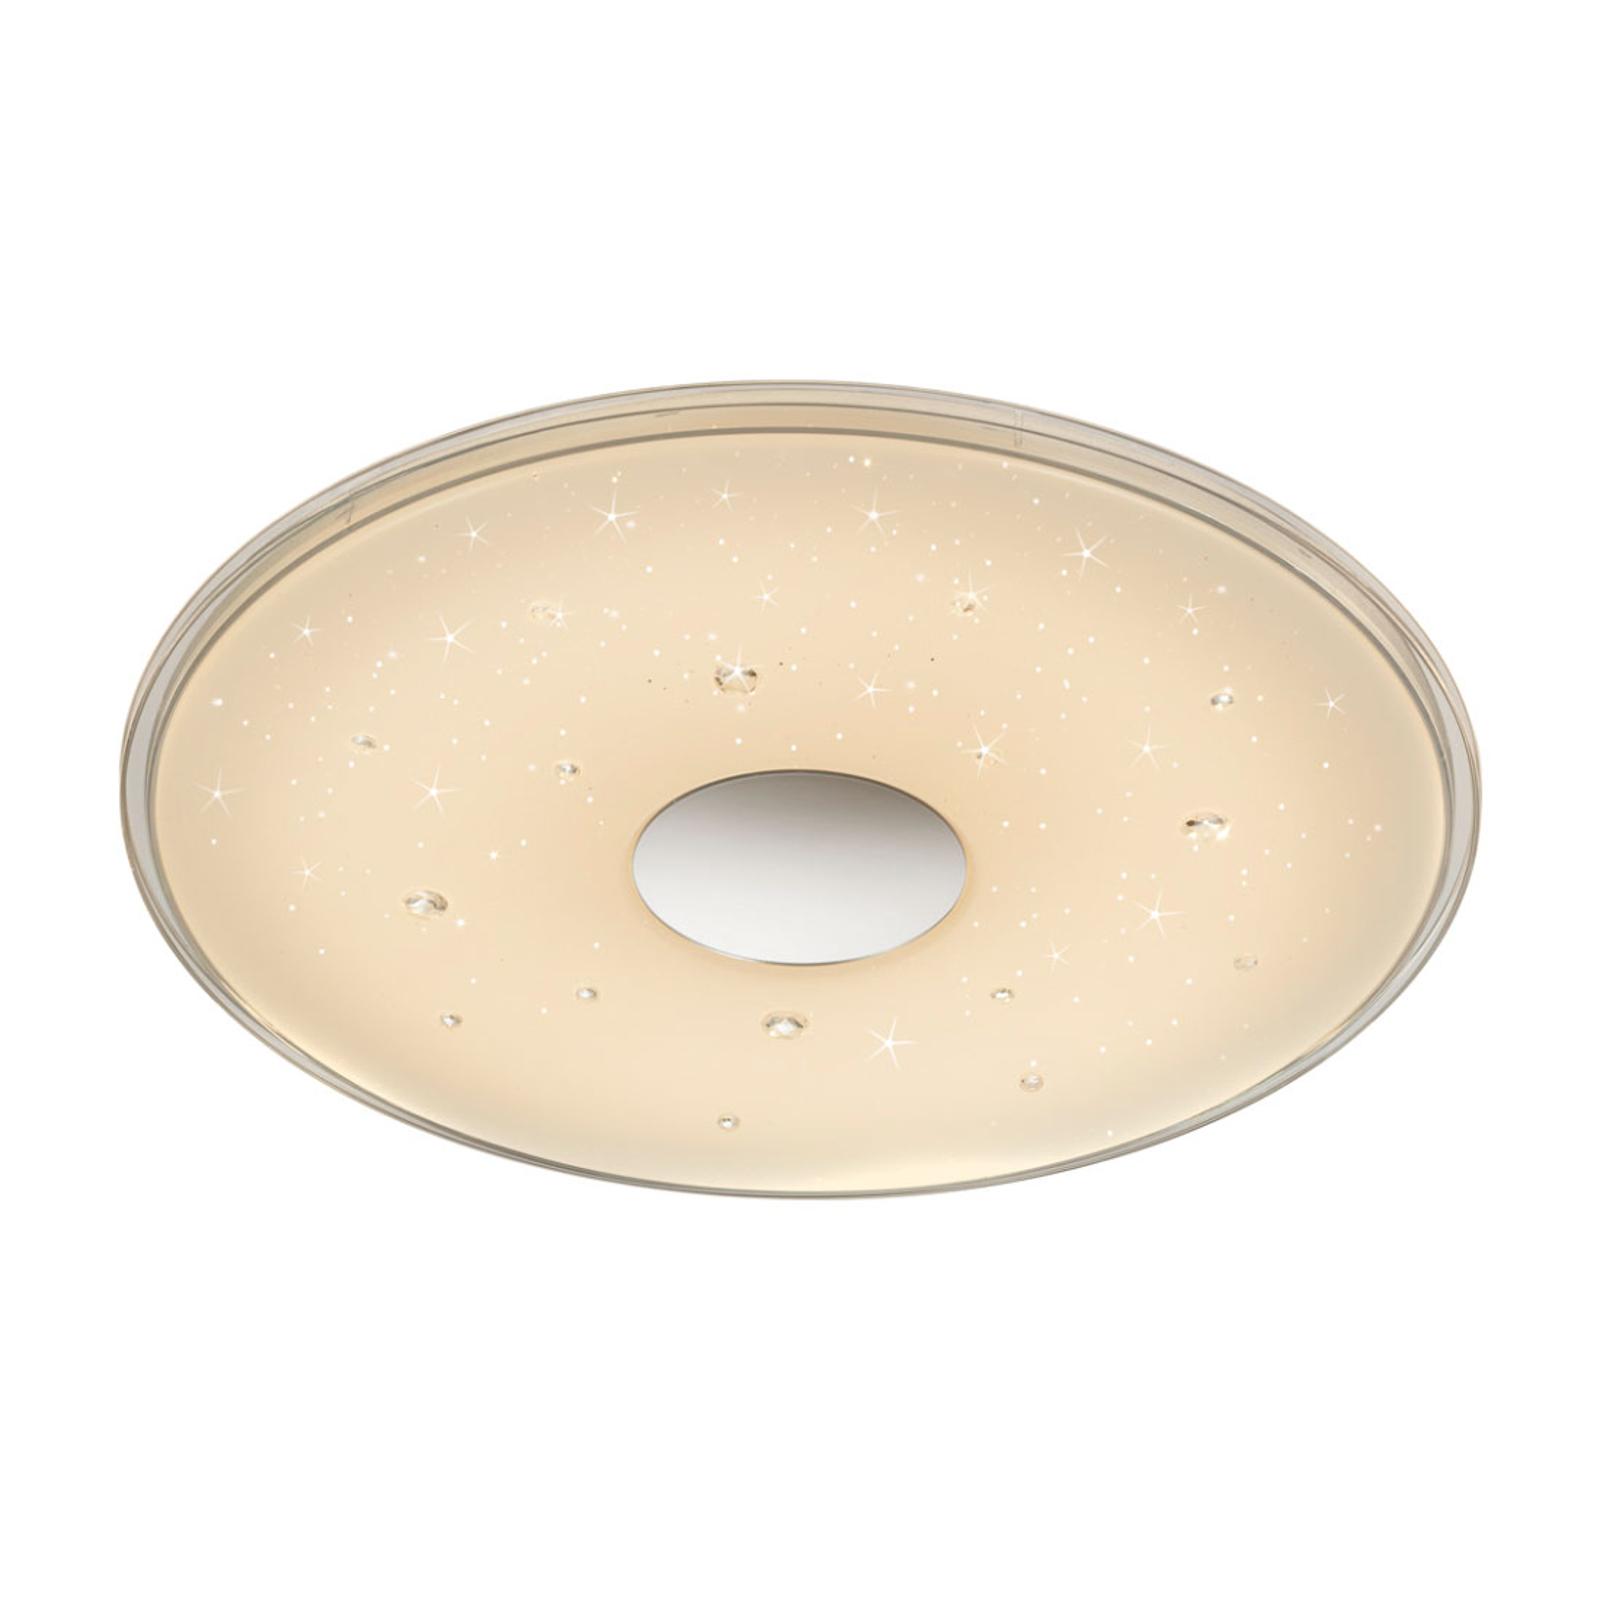 Lampa sufitowa LED Seiko, starlight, Ø 42,5cm